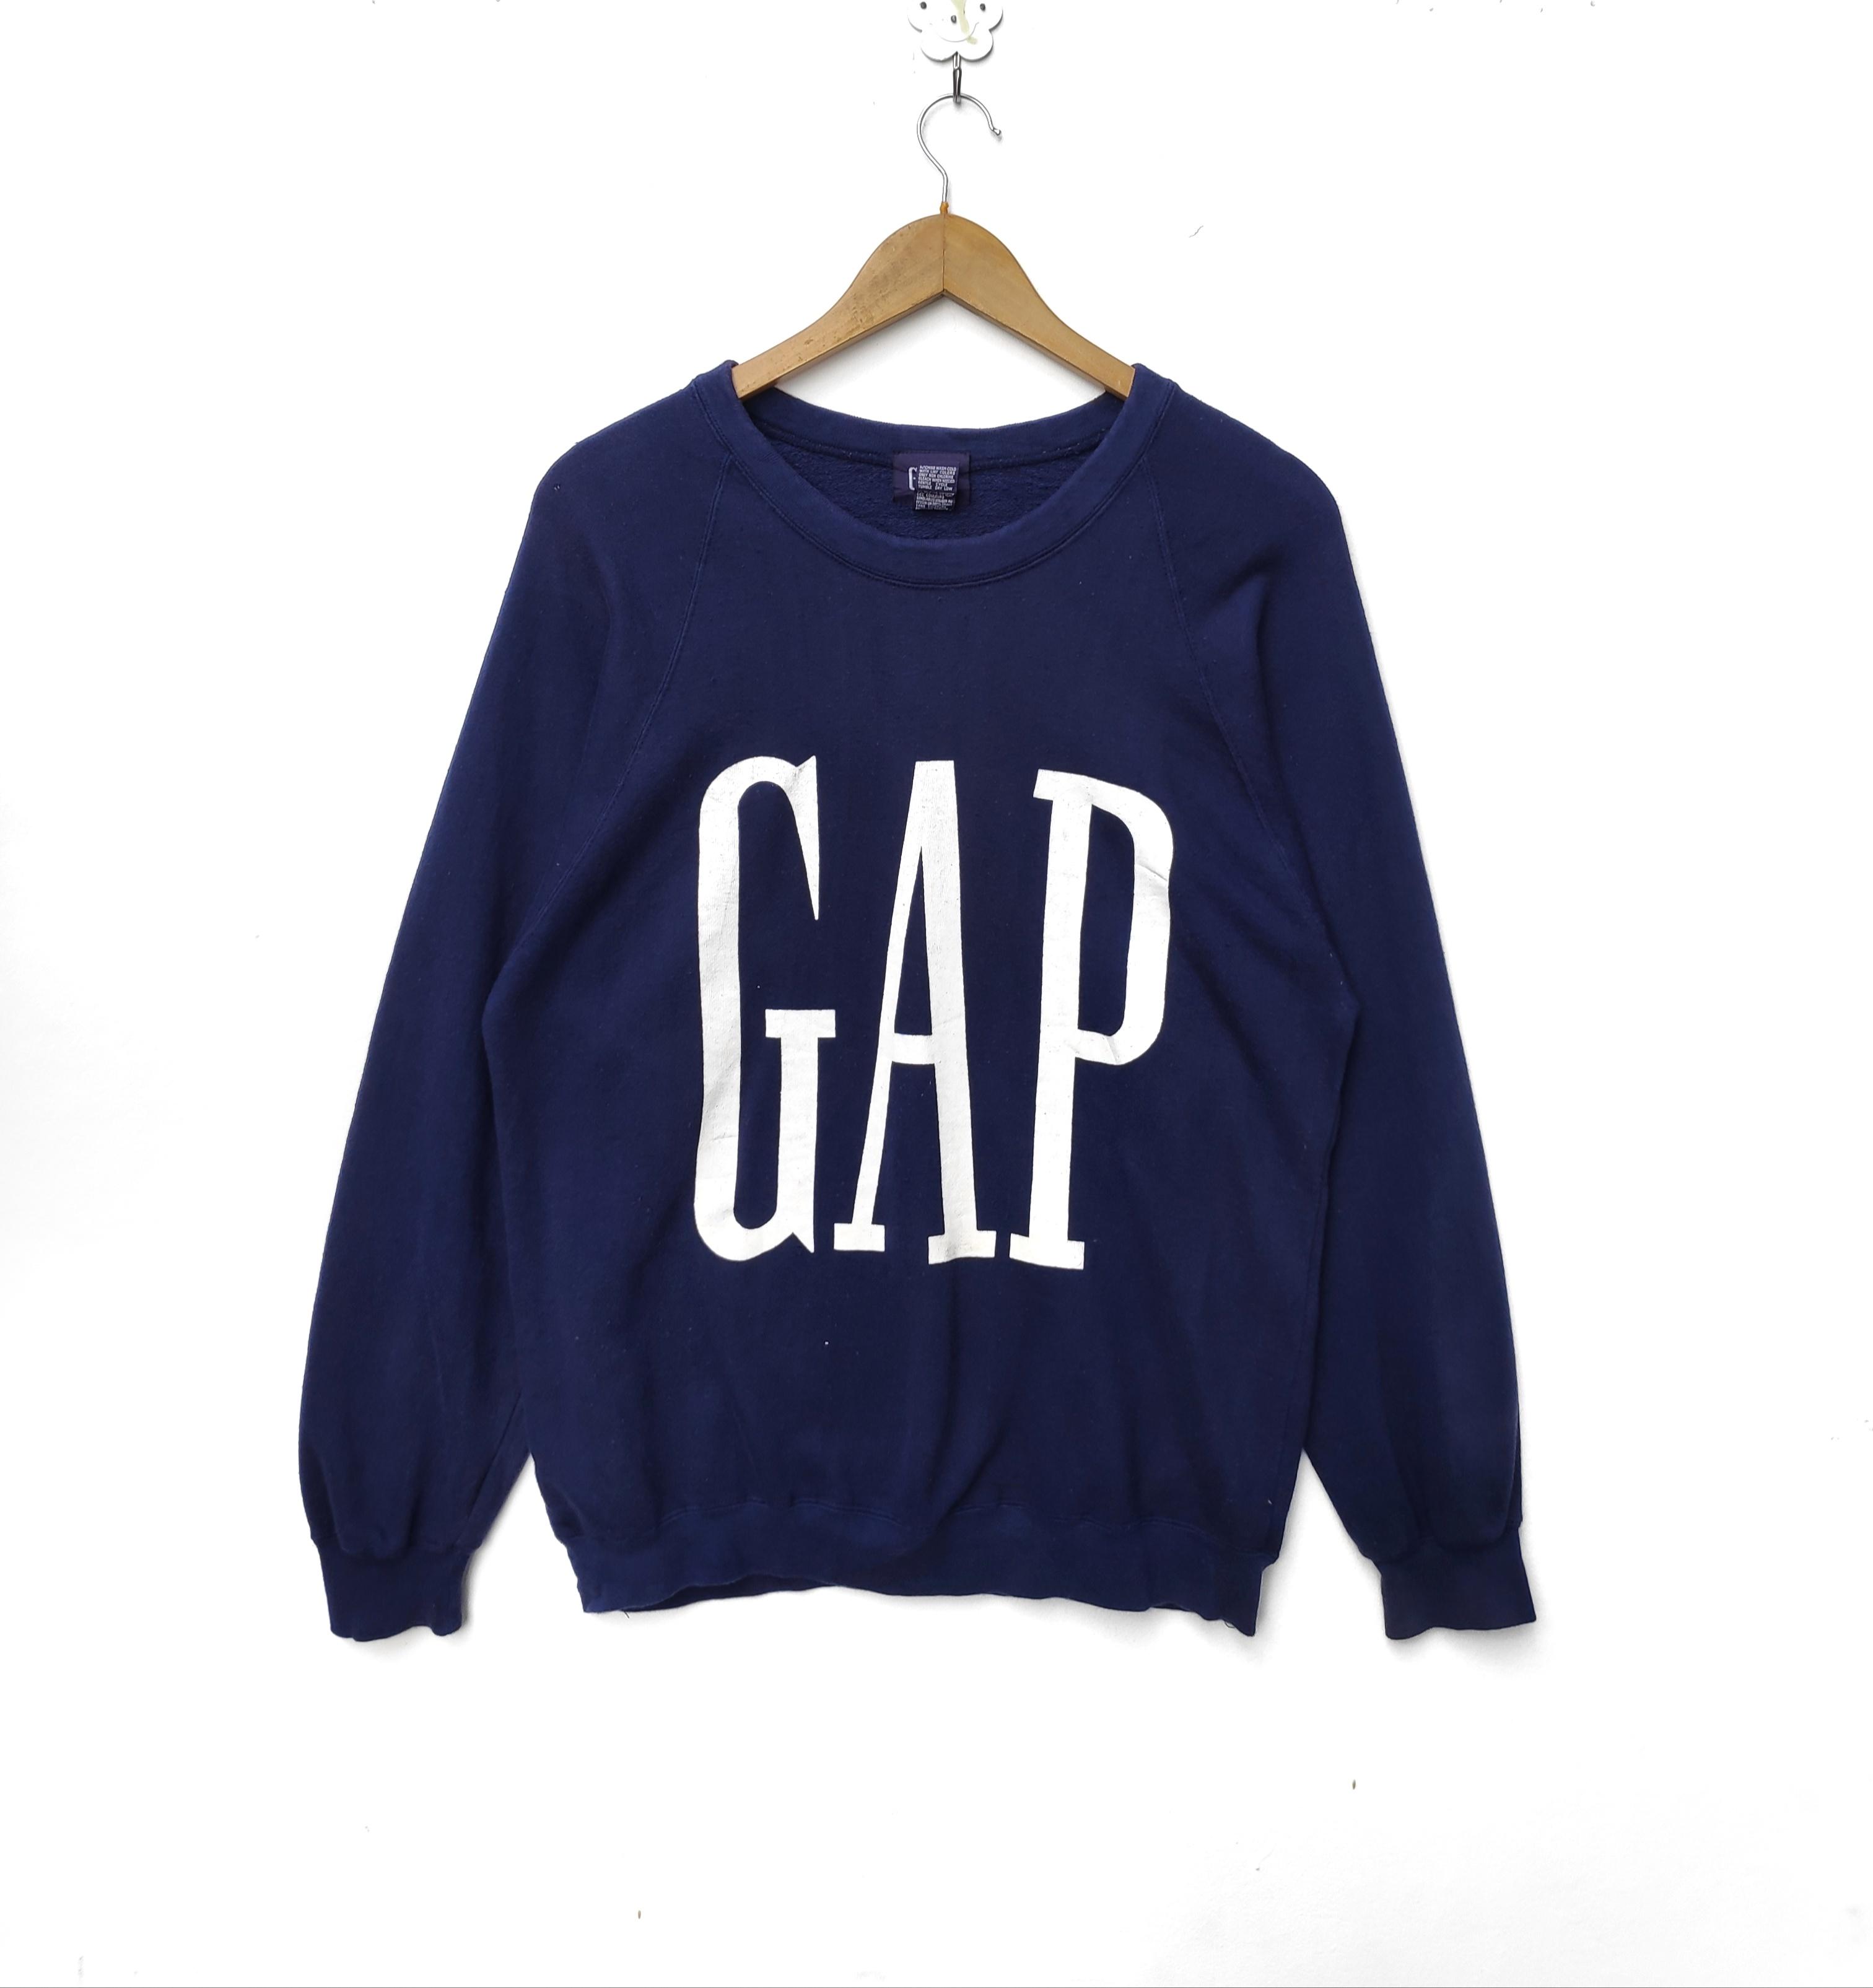 31f65aa0d13ed GAP Sweatshirt Sweater Crewneck Pullover Jumper Big Logo Hip Hop Swag Rap  tee Shirt 90s Sportswear Streetwear Urban